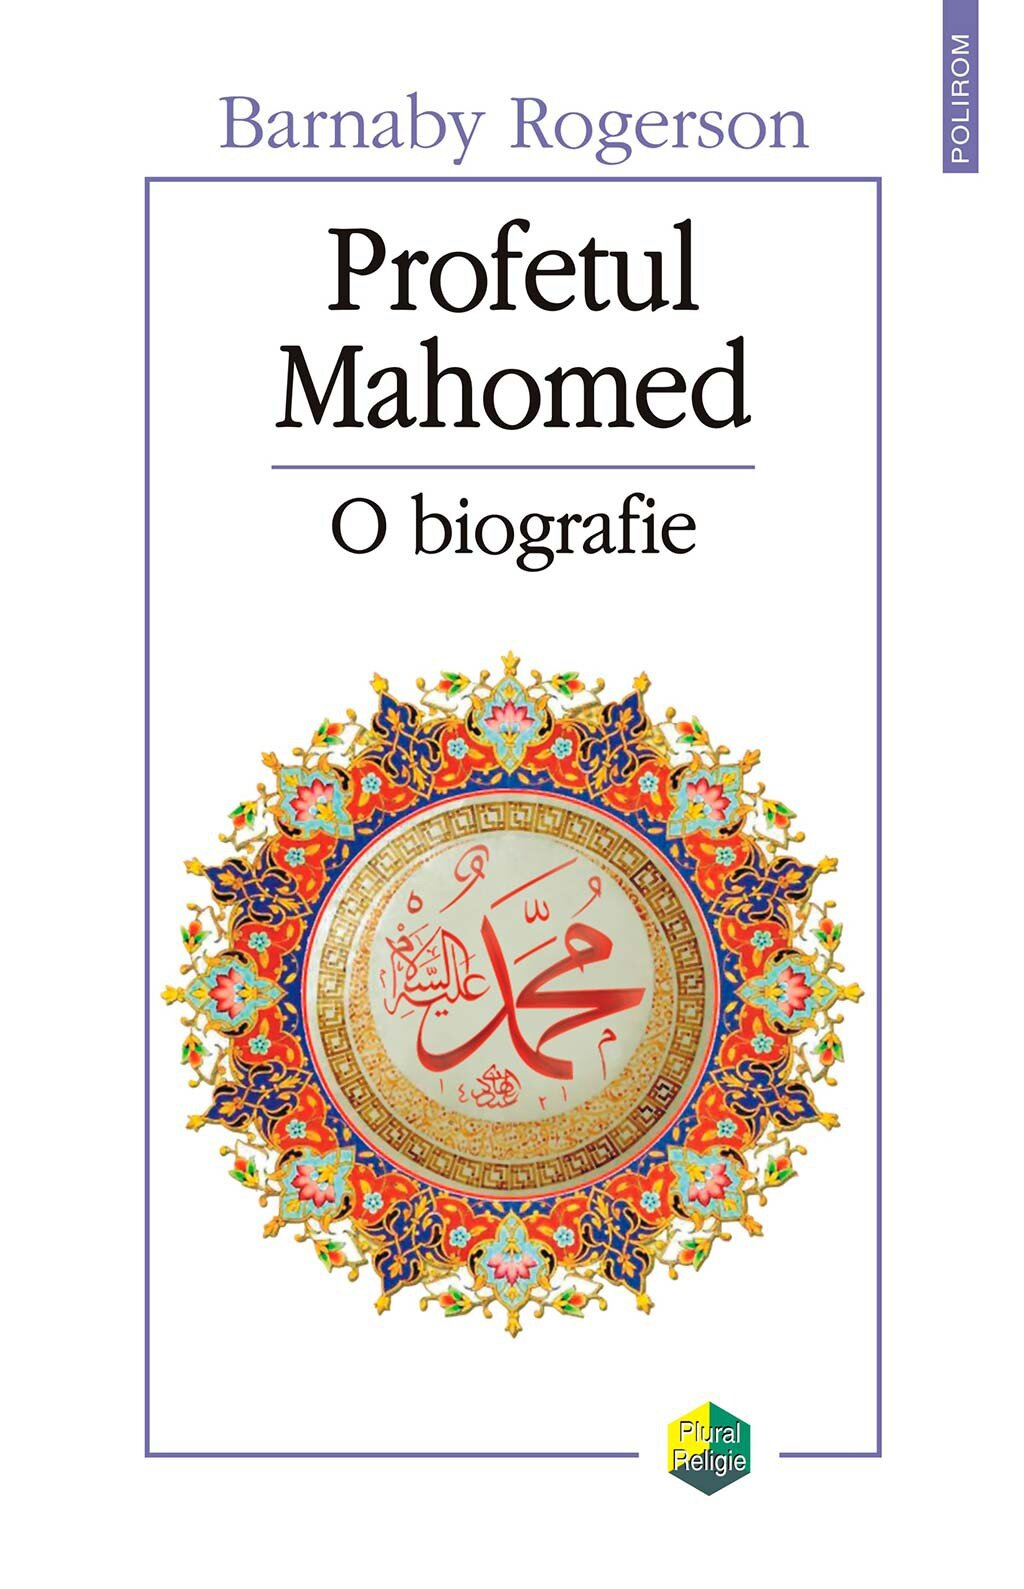 Profetul Mahomed. O biografie PDF (Download eBook)